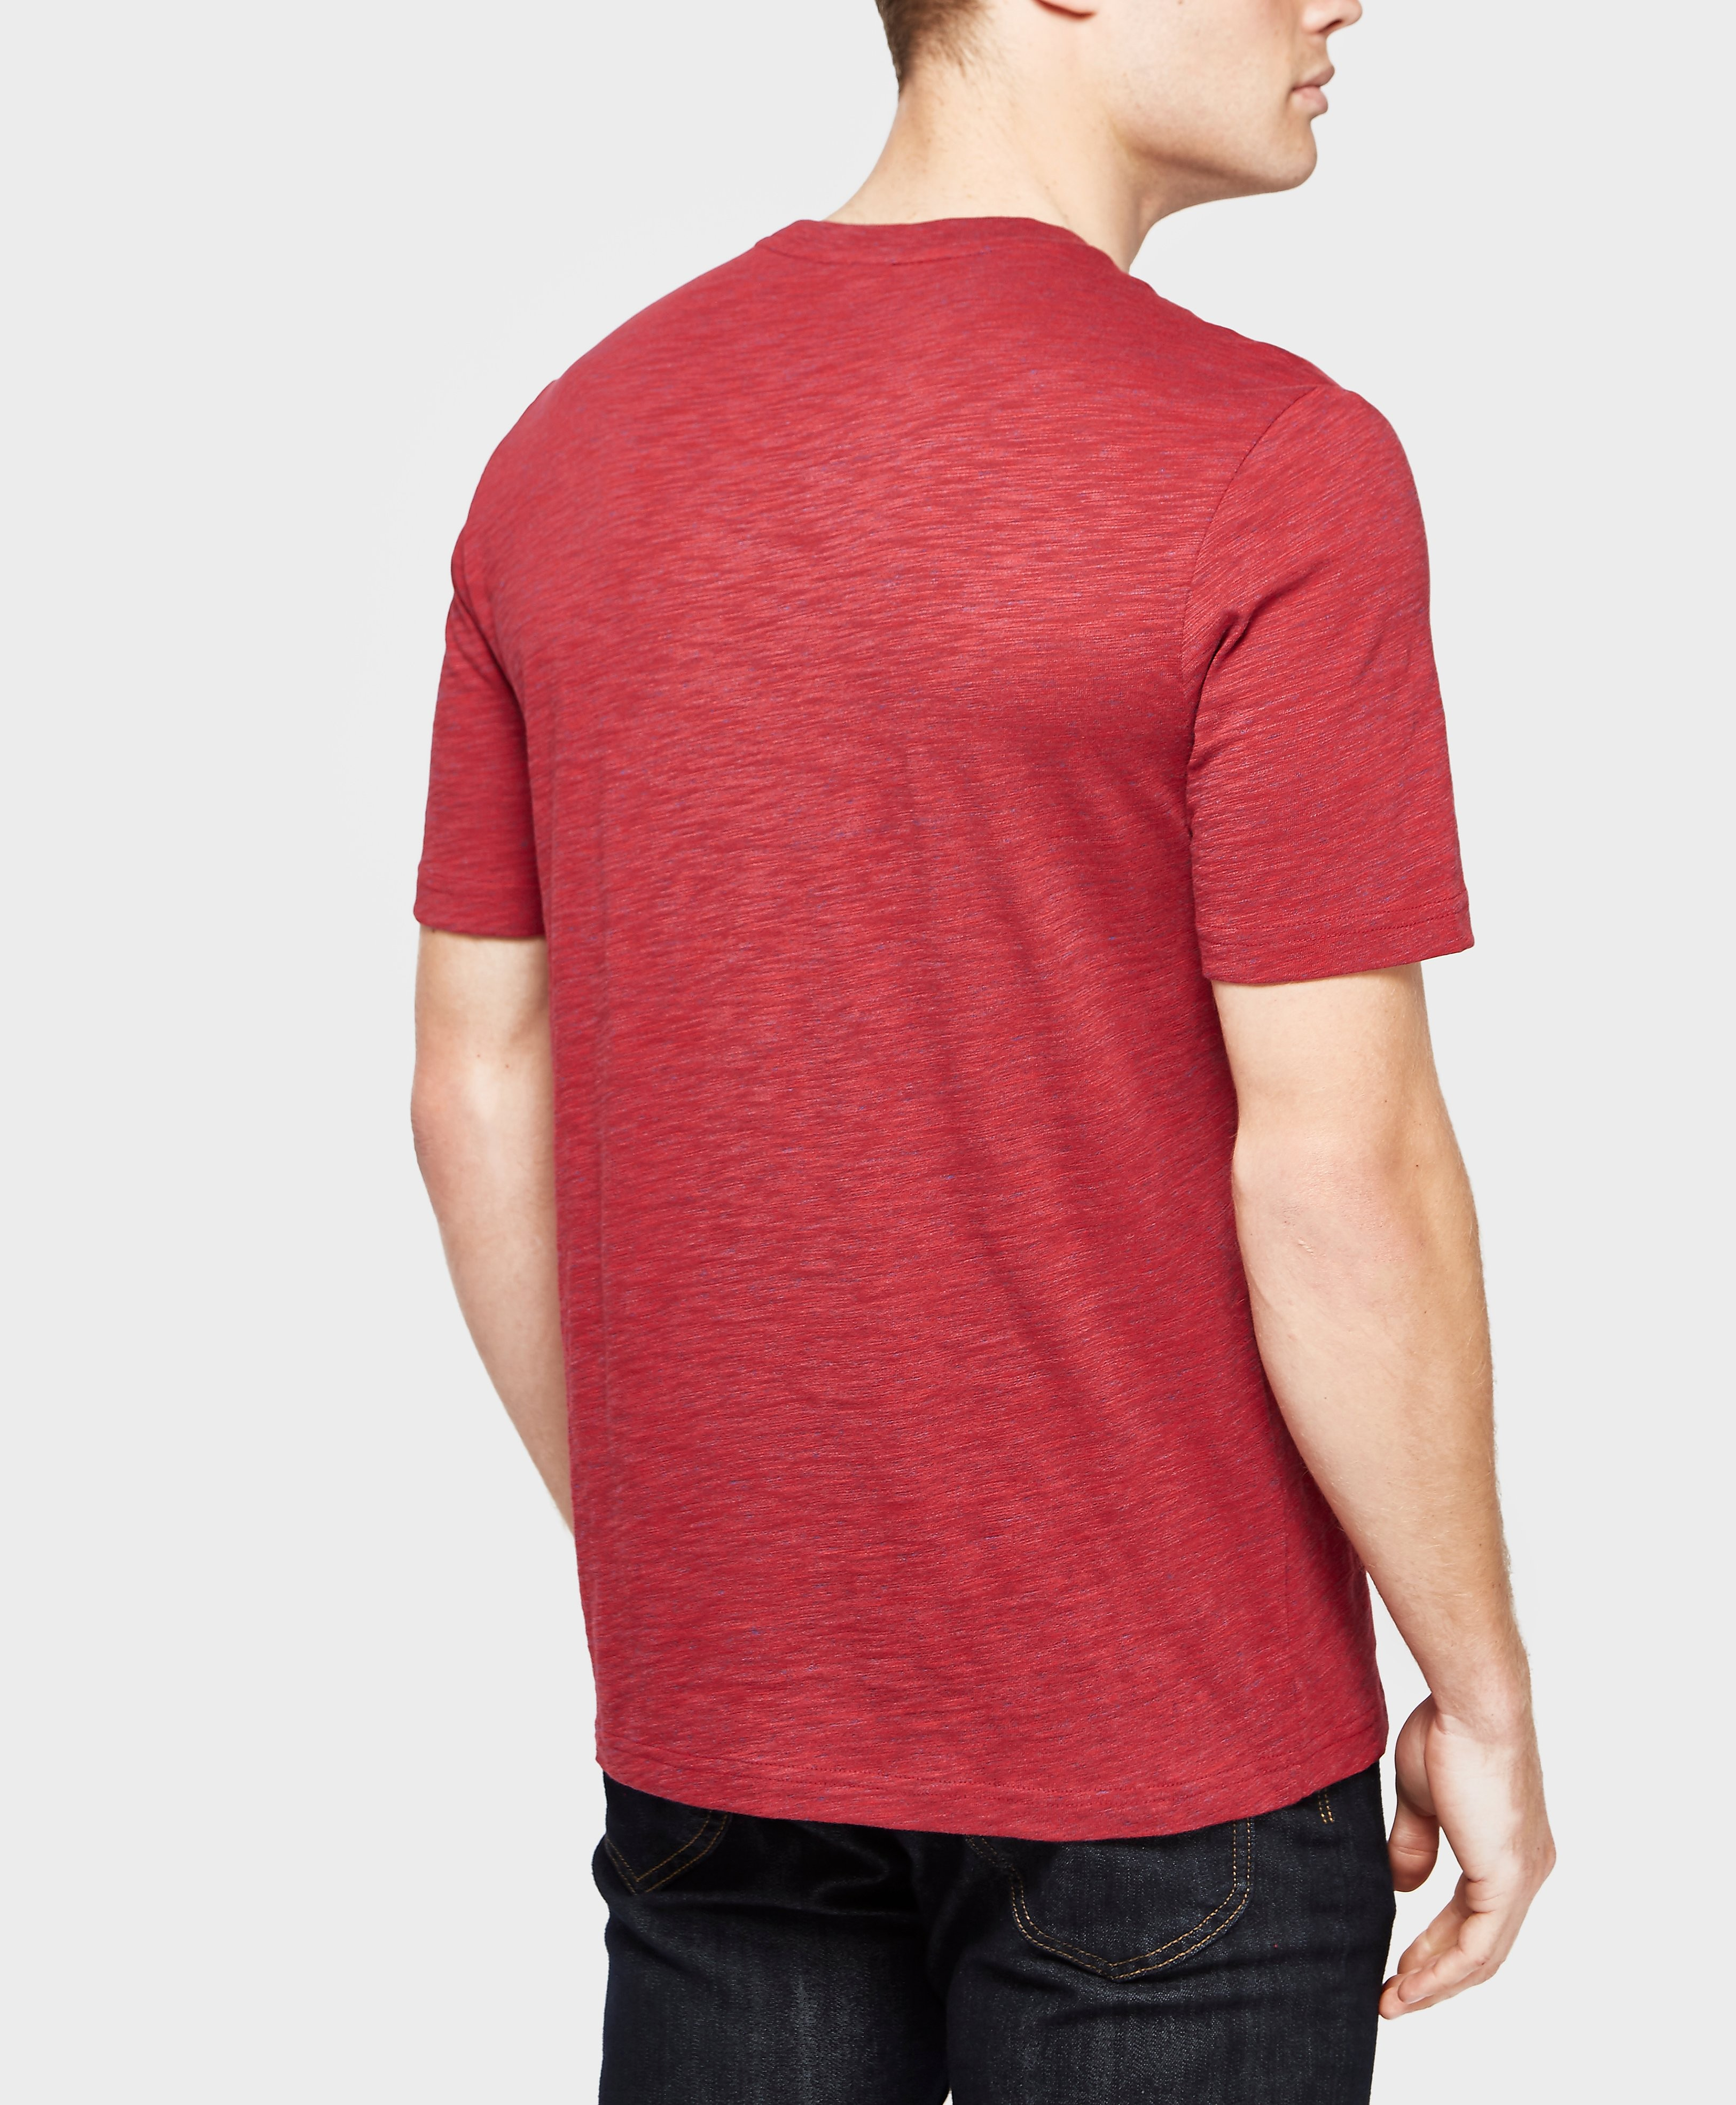 Lacoste Live Pocket T-Shirt